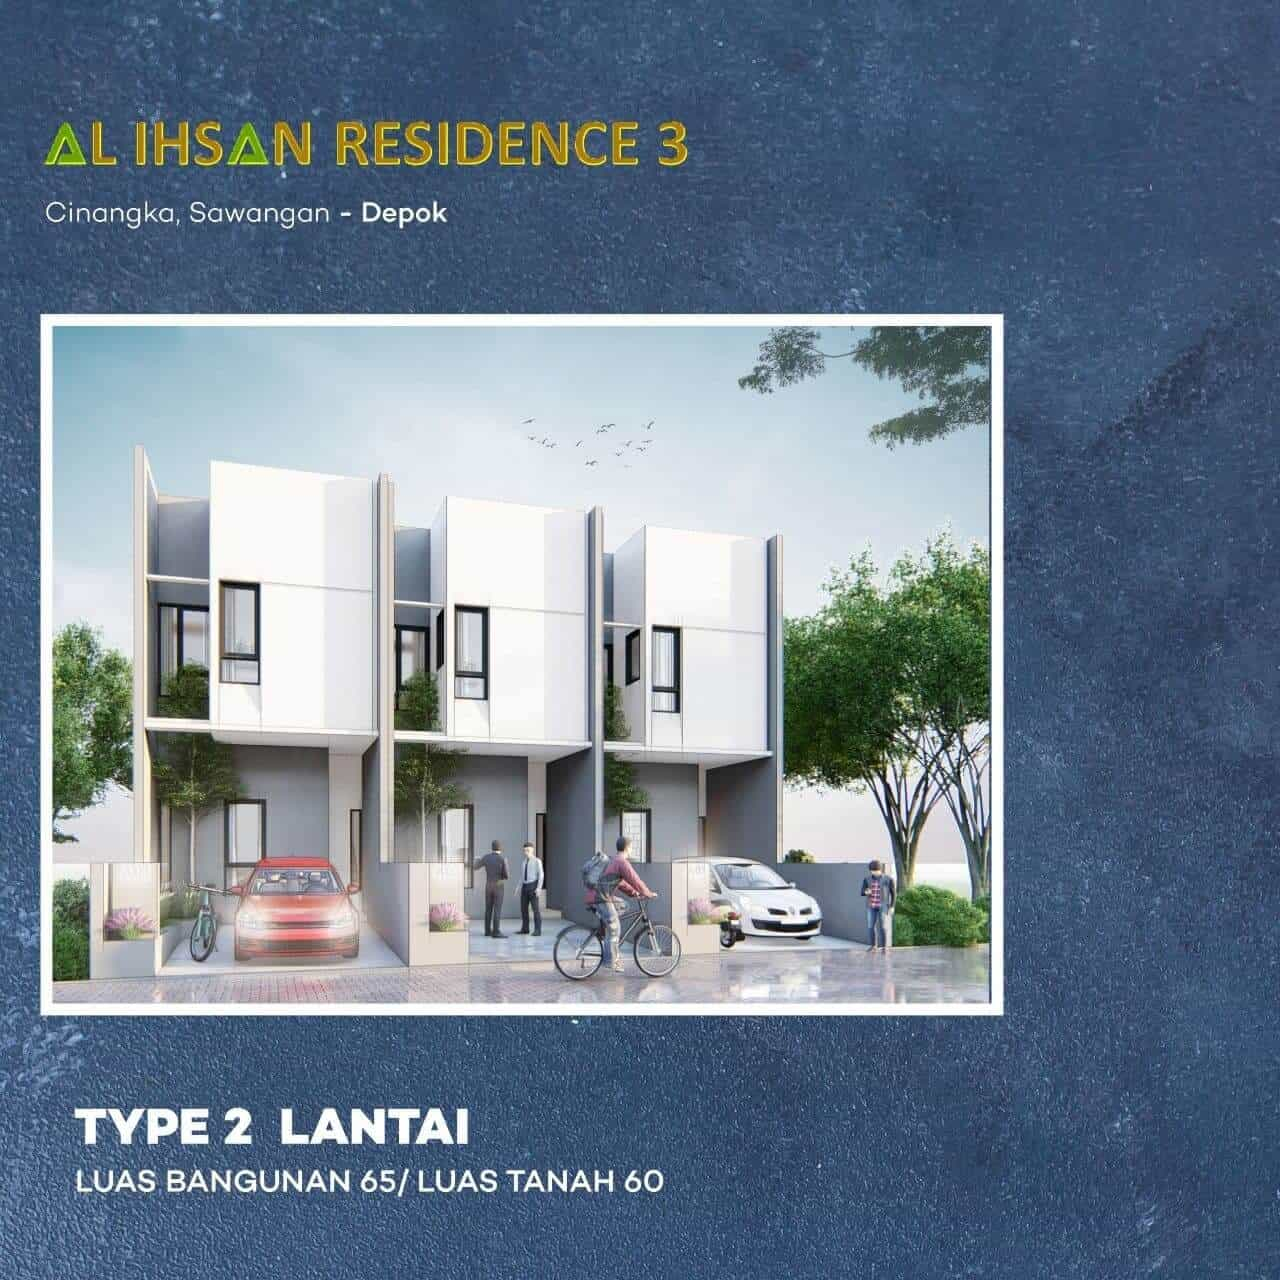 perumahan-syariah-depok-perumahan-islami-depok-kpr-syariah-depok-siteplan-al-ihsan-residence-3-dav-property-syariah (6)